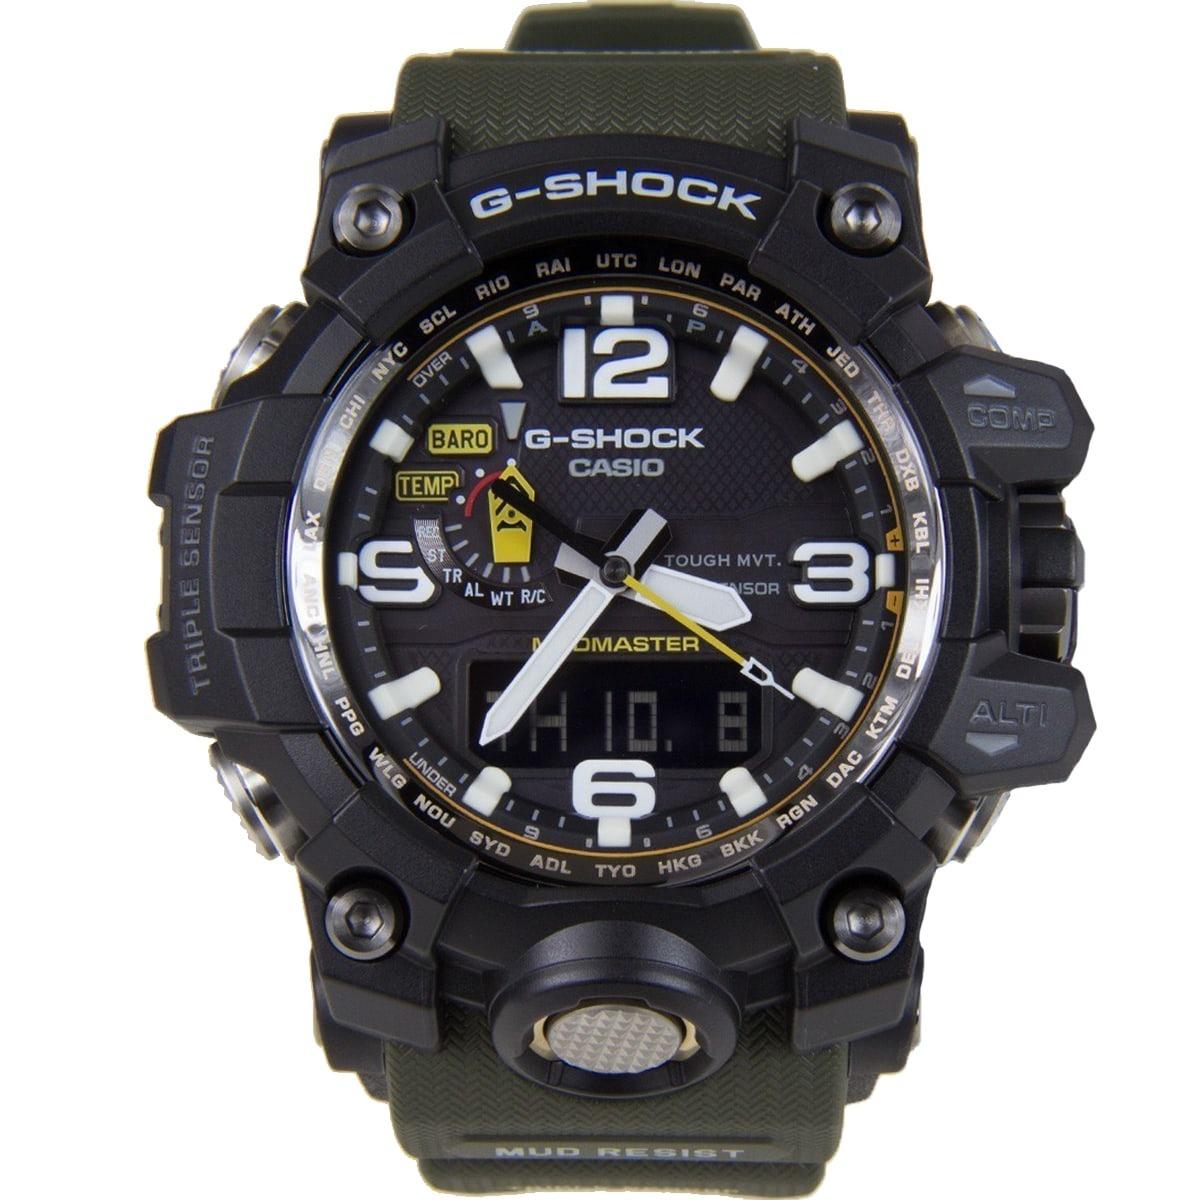 8e8c7b6ac05 relógio casio g-shock mudmaster masculino gwg-1000-1a3dr. Carregando zoom.